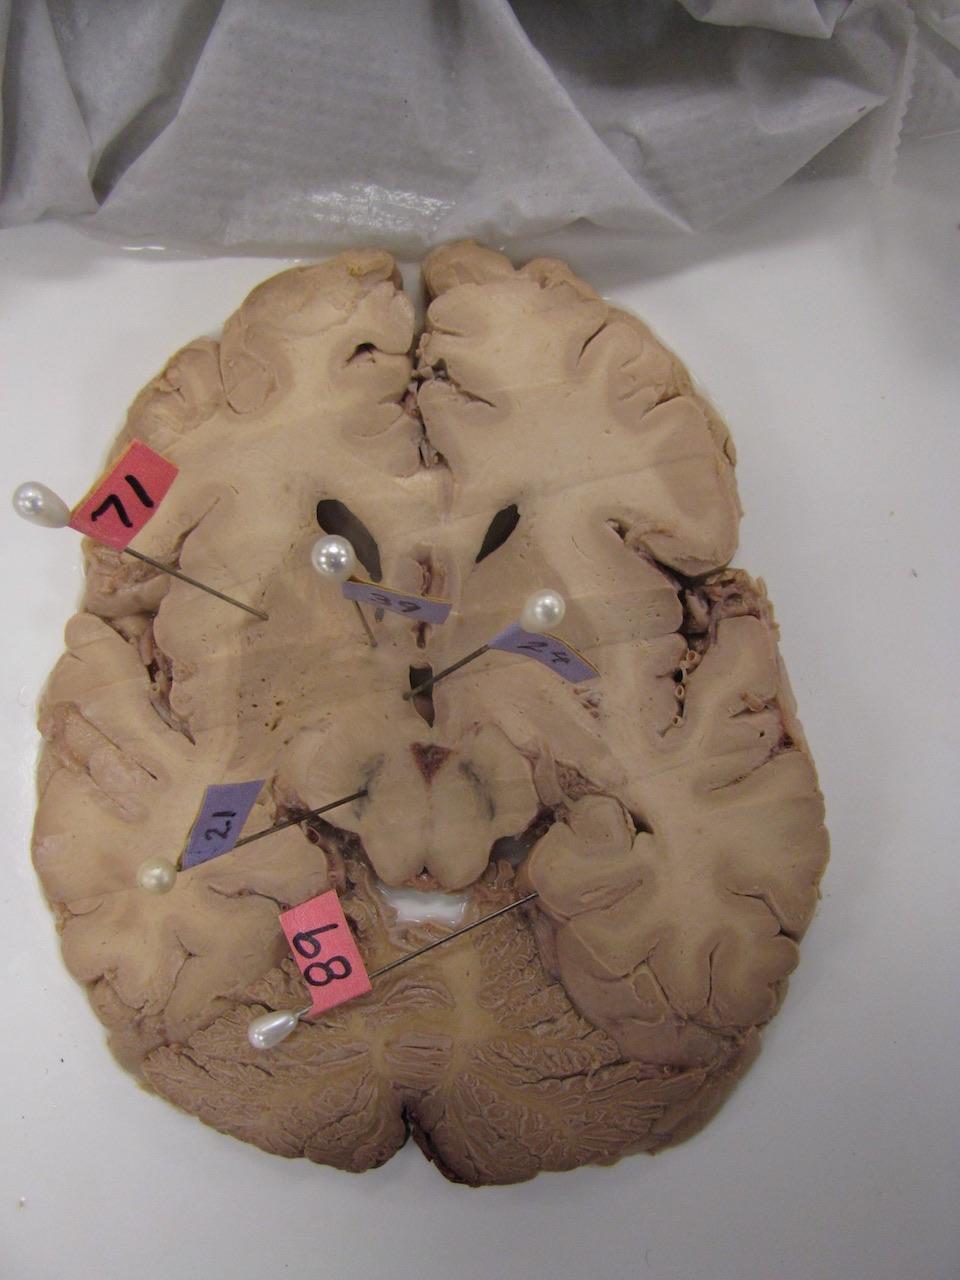 Cerebro con síntomas de Parkinson- SINC, M T Youngerer